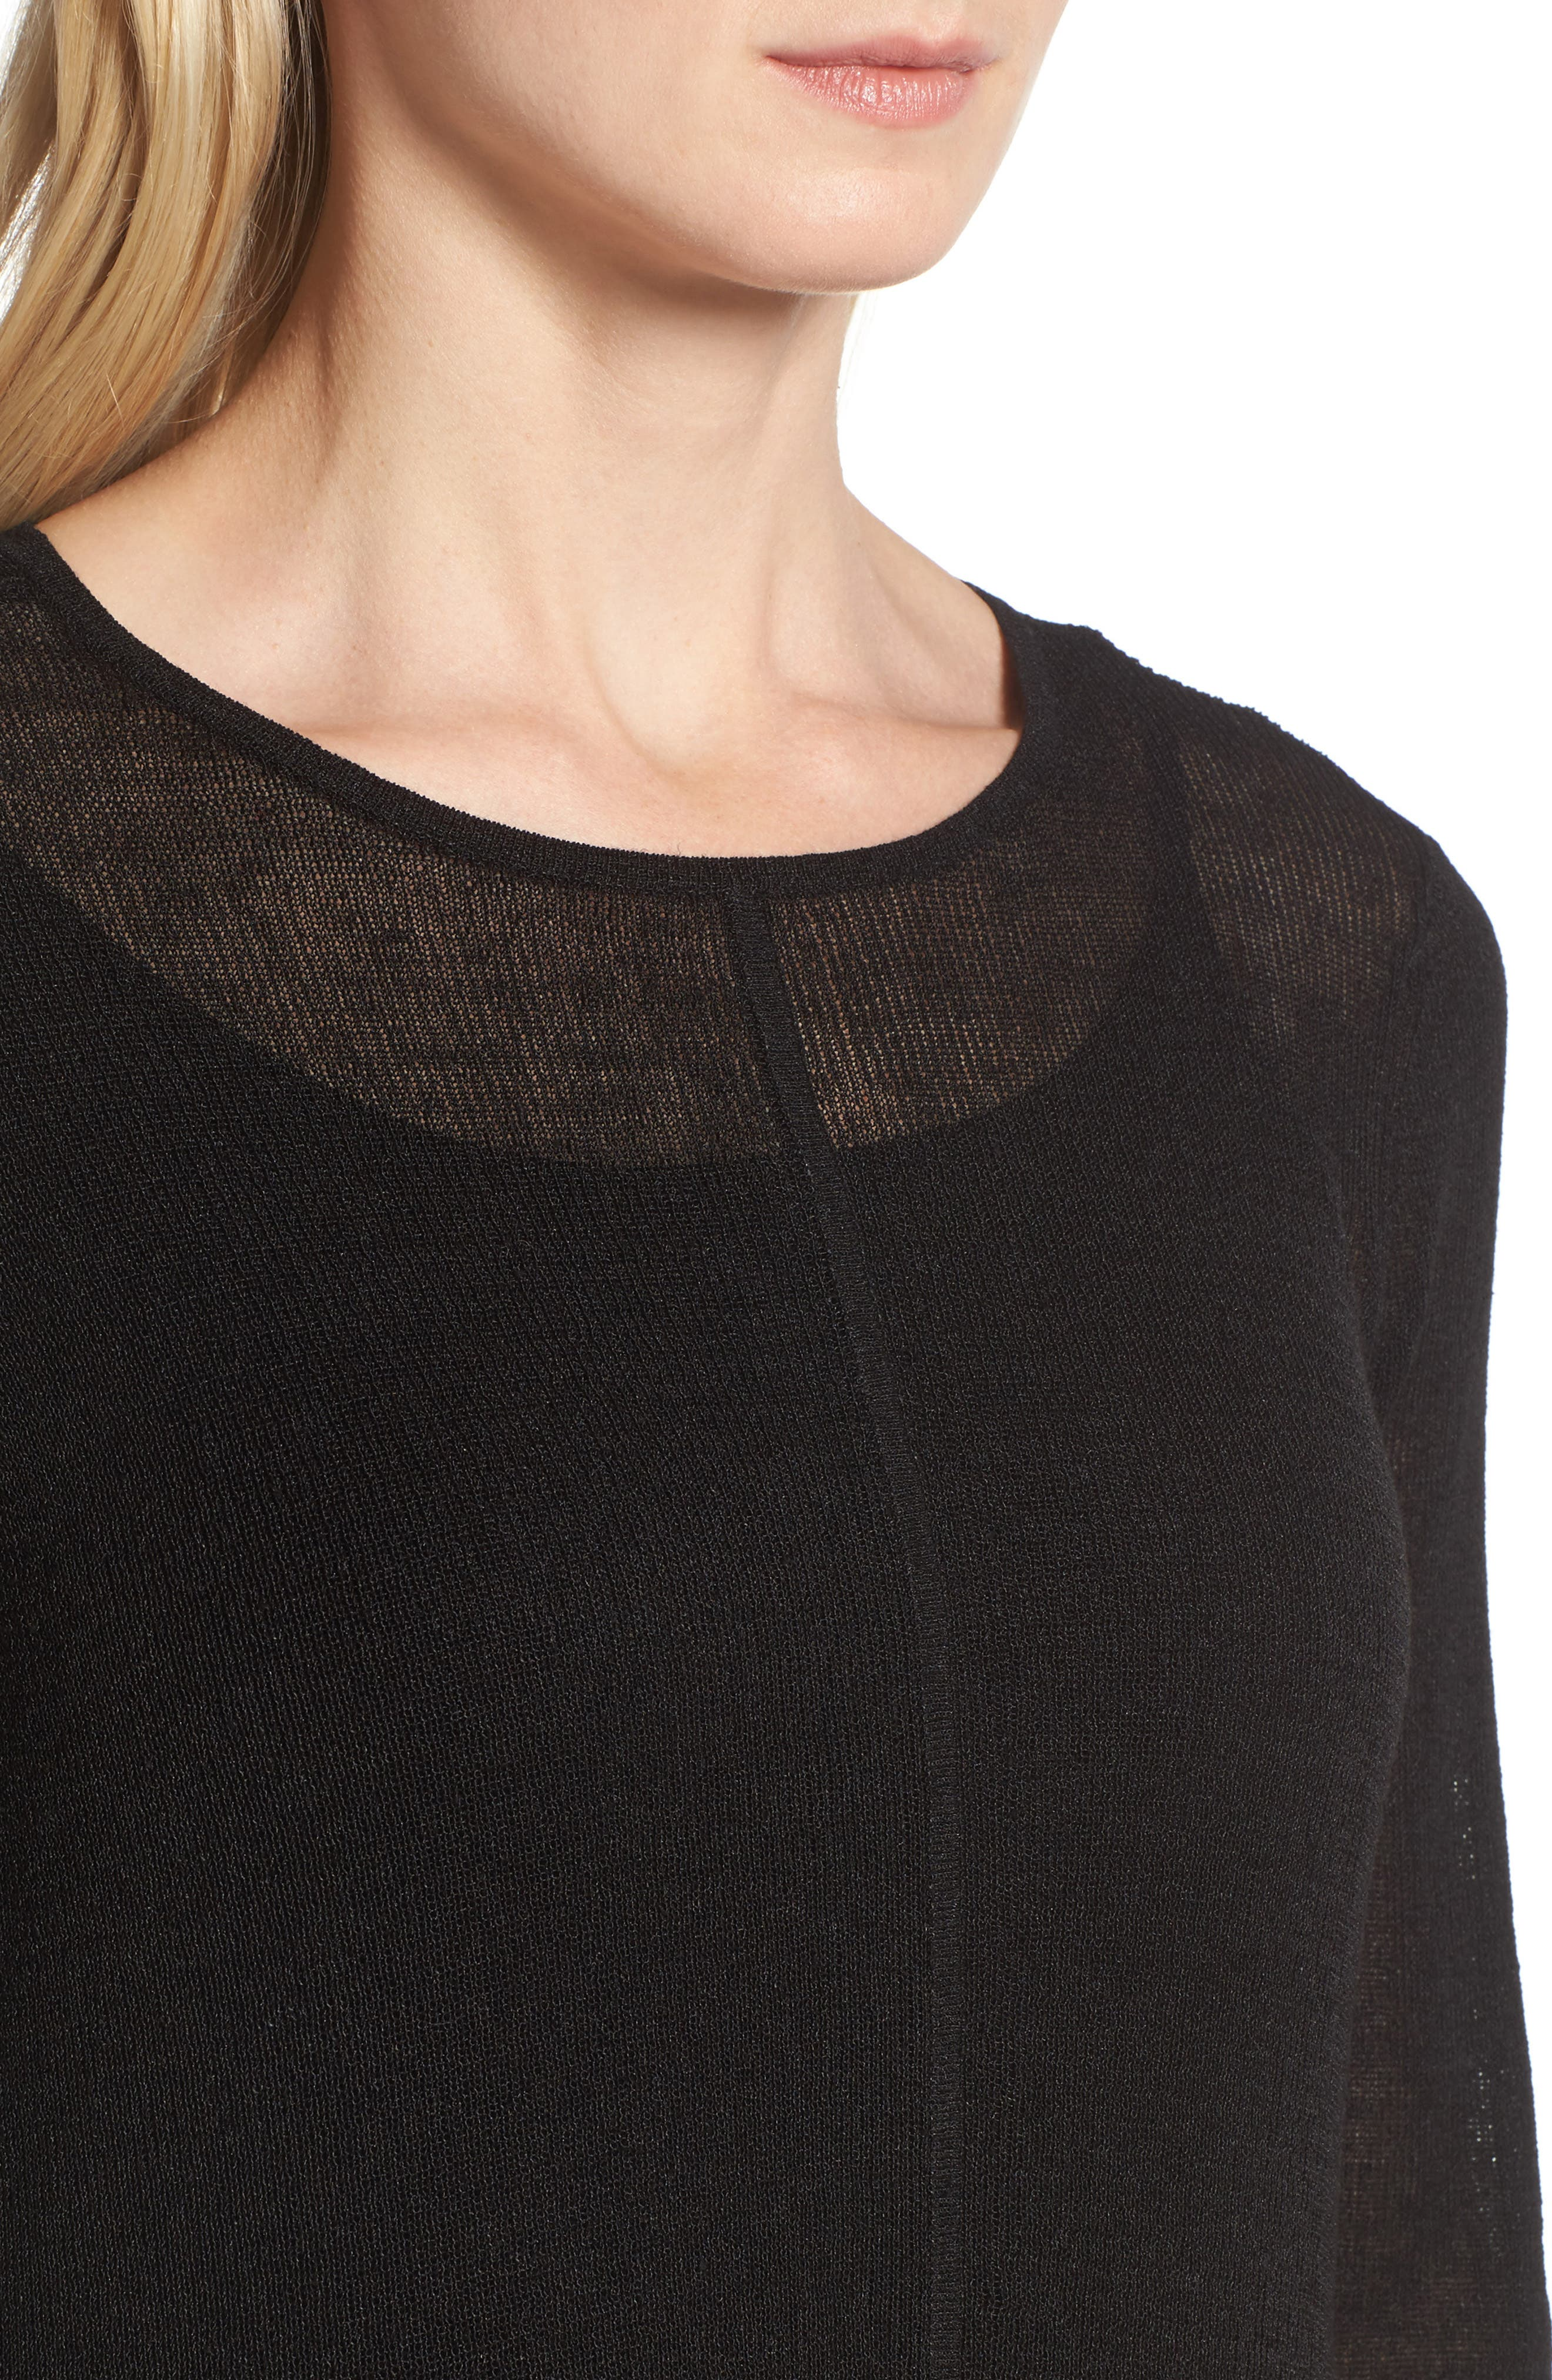 Organic Linen Blend A-Line Dress,                             Alternate thumbnail 4, color,                             001